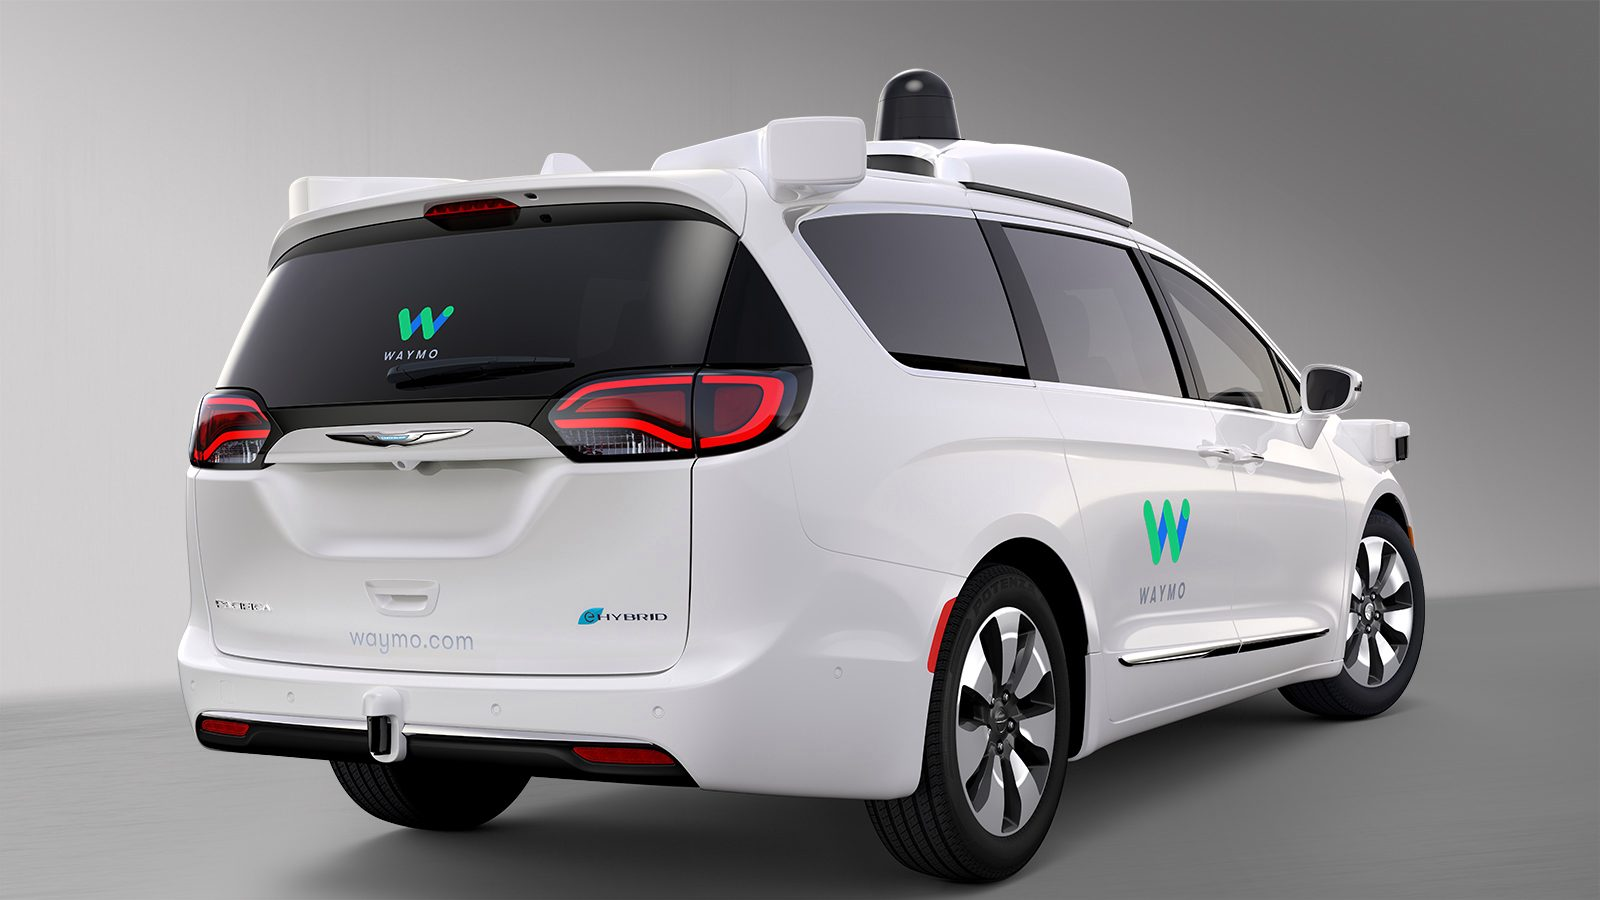 Honda, Google start negotiations on self-driving cars